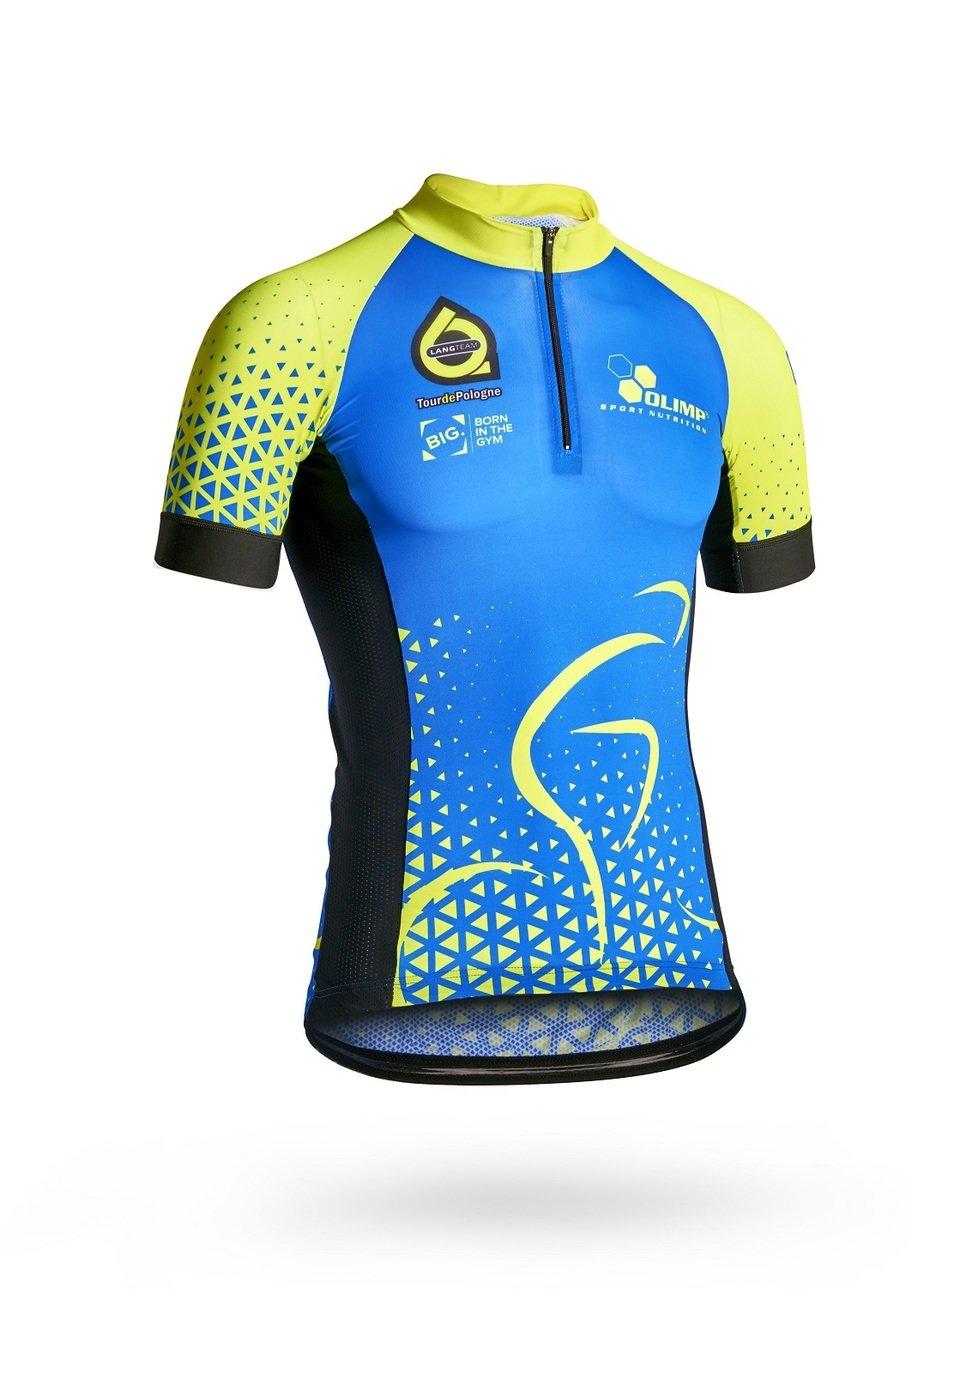 Gadżety z Tour de Pologne już na Allegro!.jpg